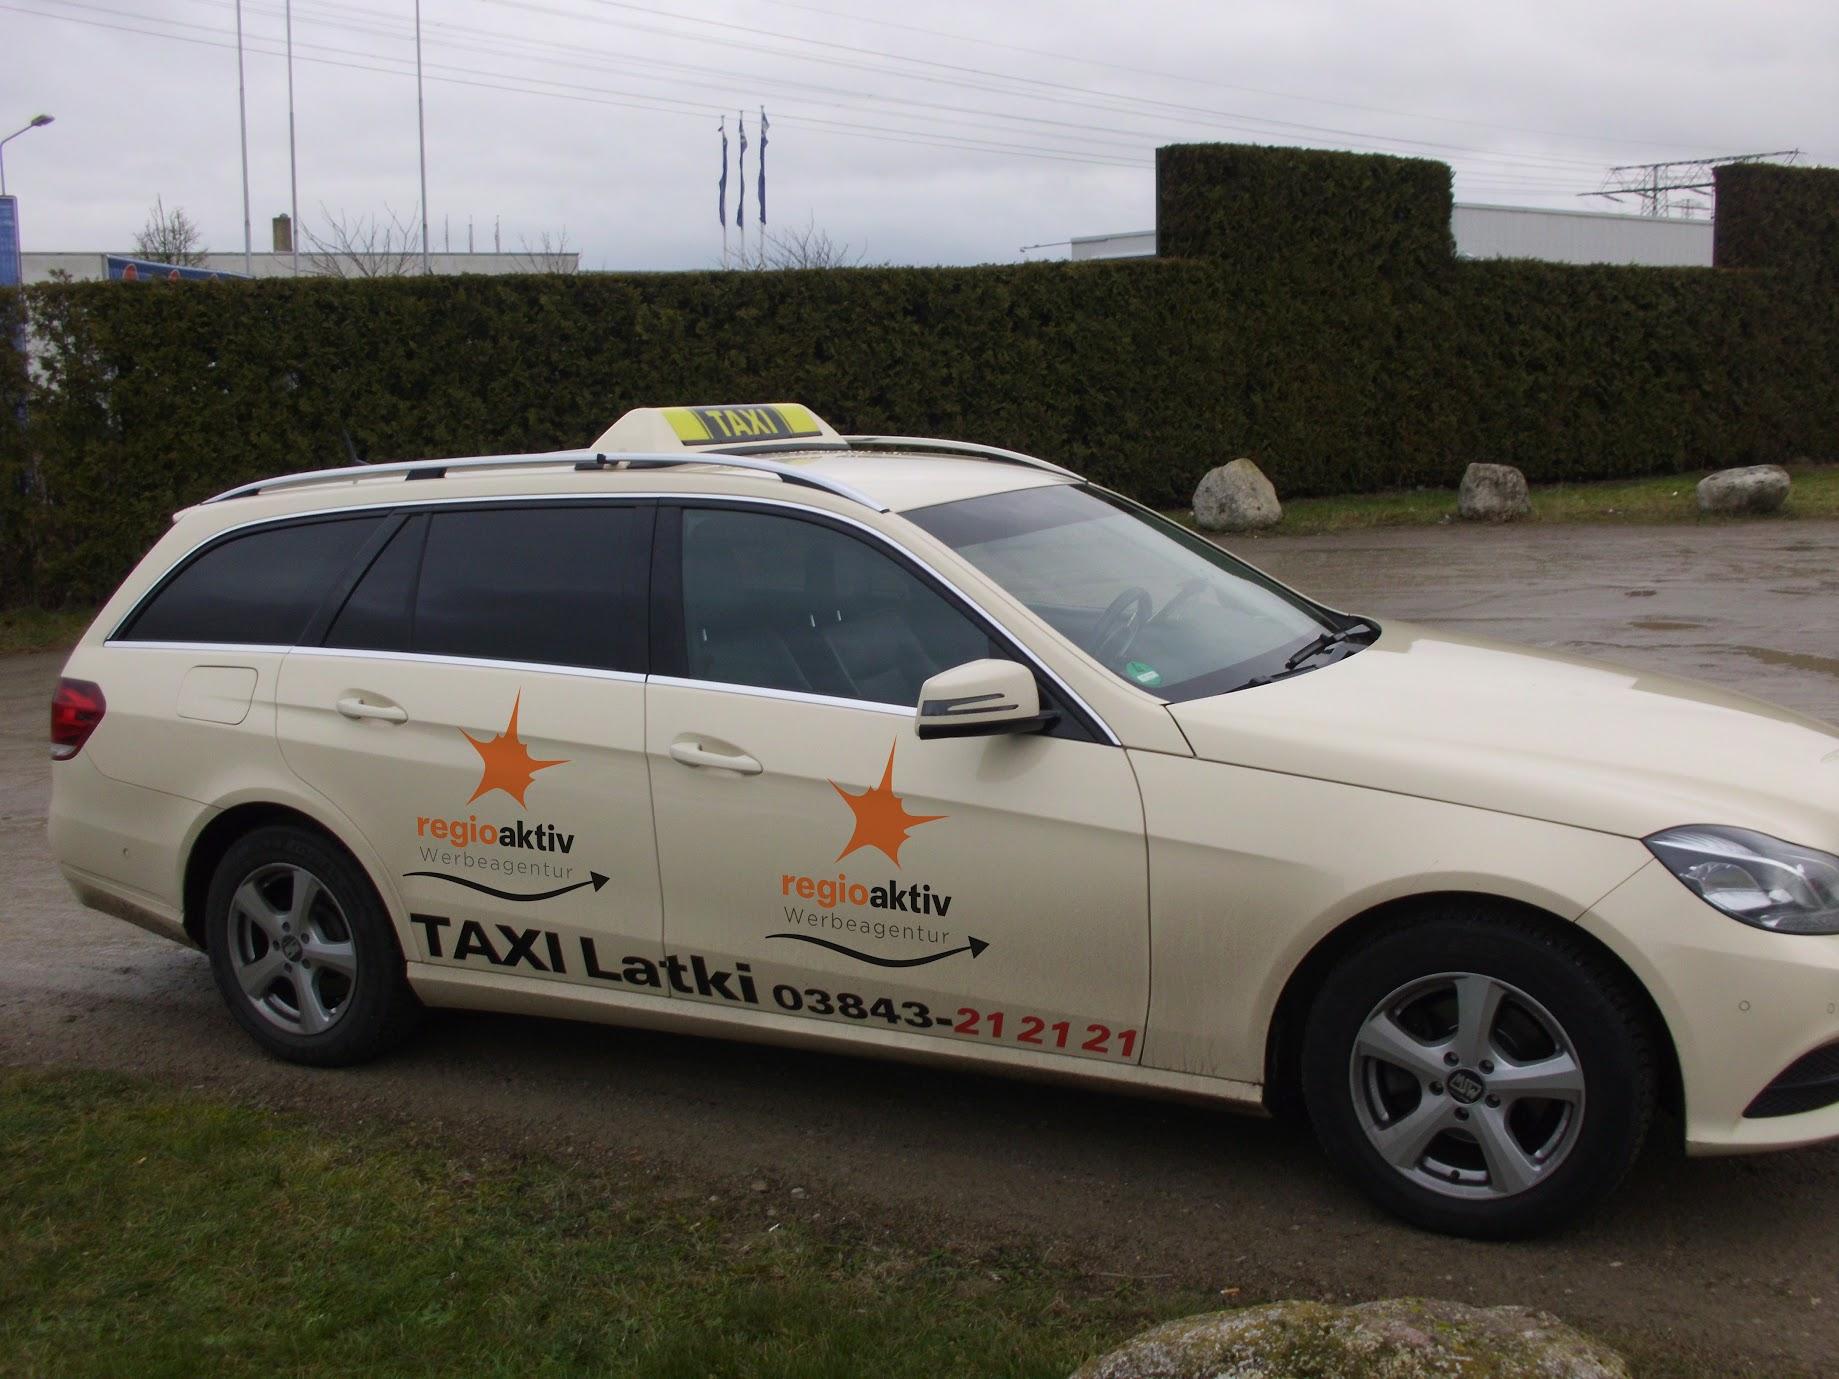 Taxi Werbung Werbeagentur